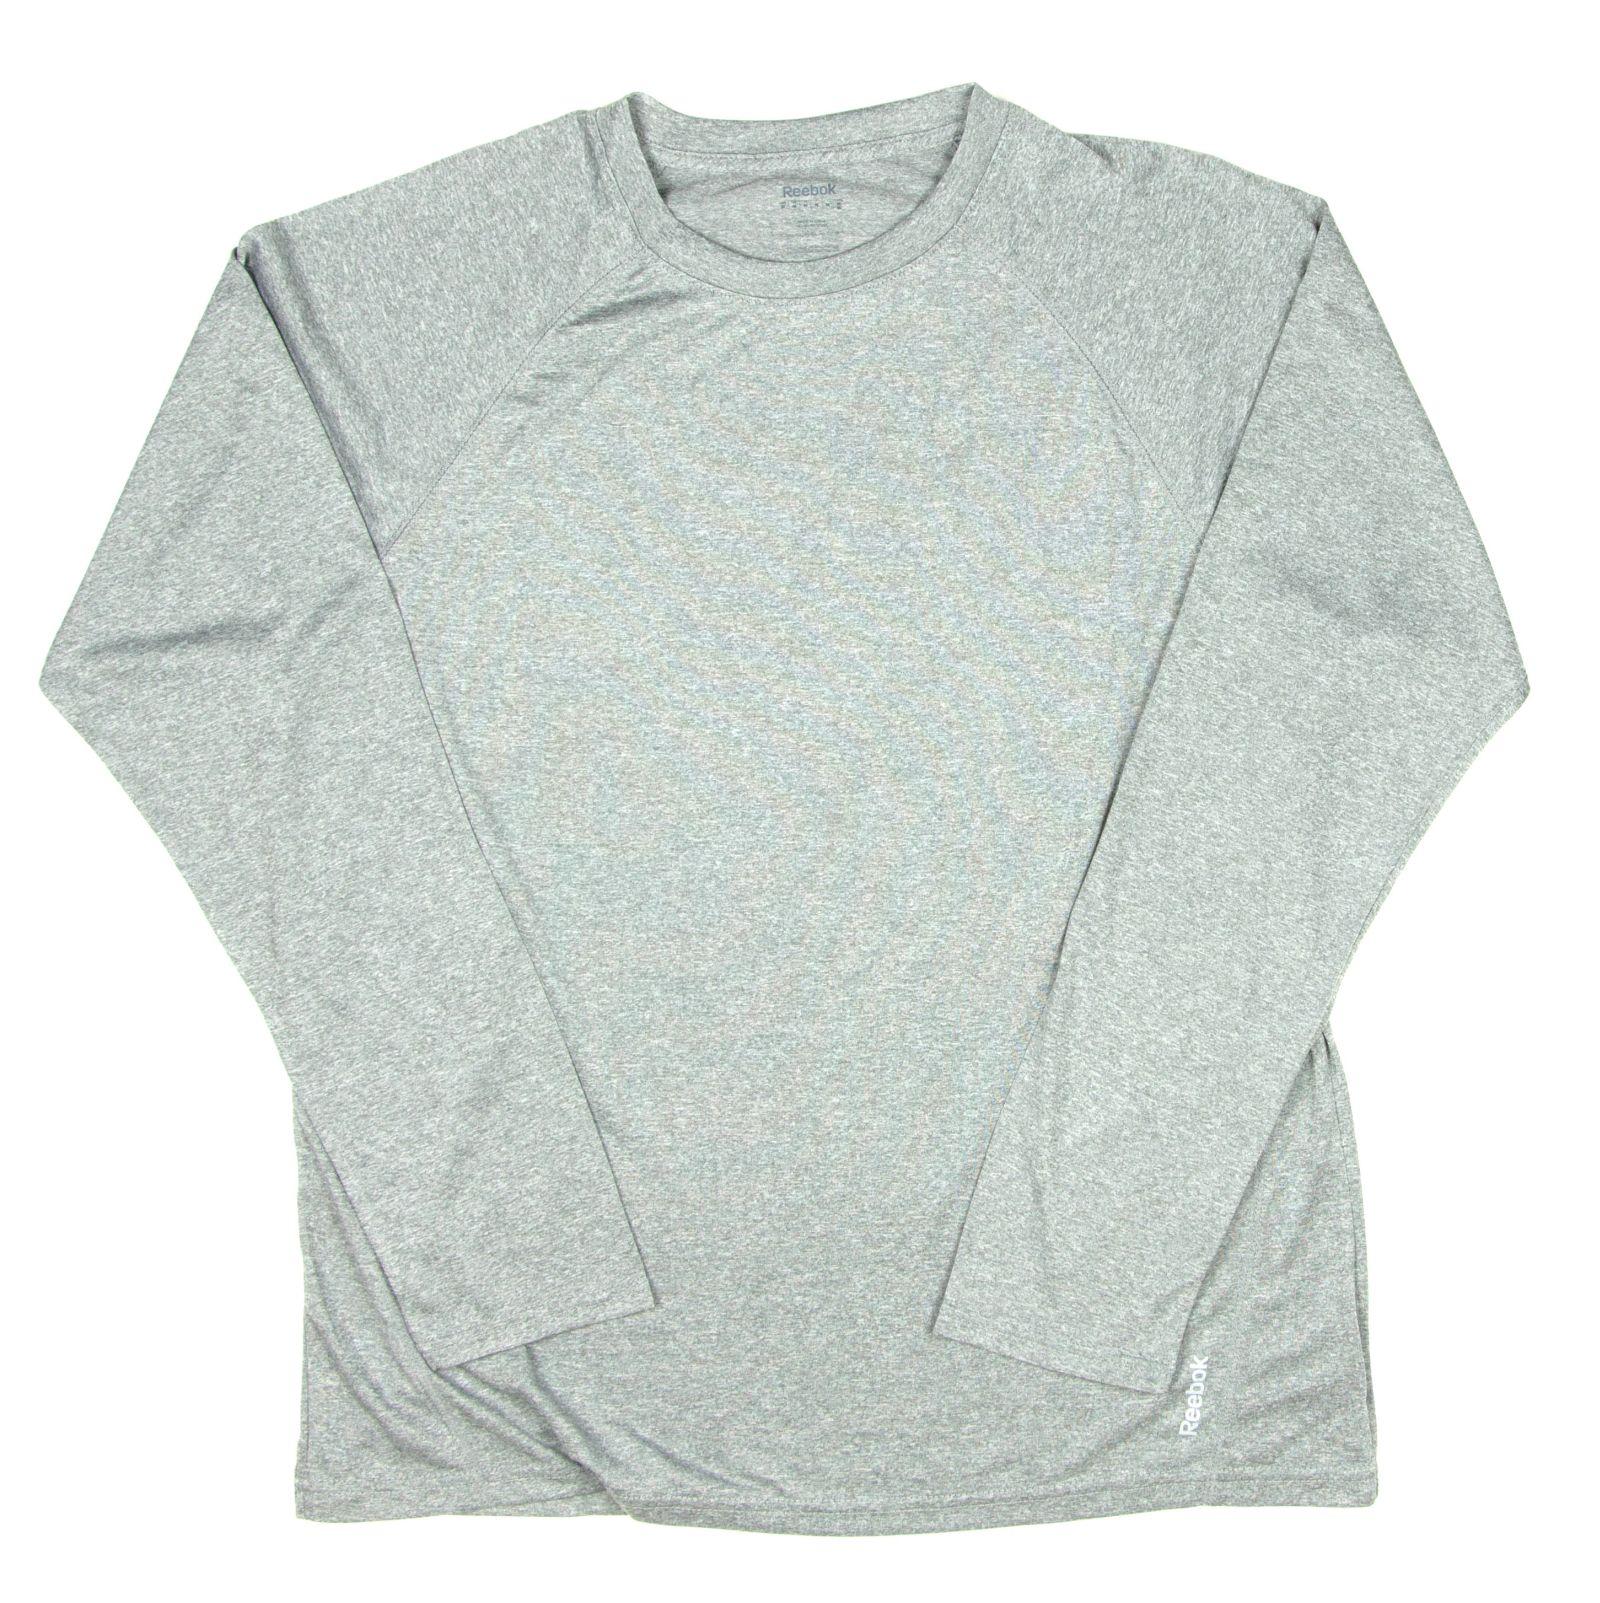 Reebok Mens Performance Long Sleeve Active Tee T Shirt X